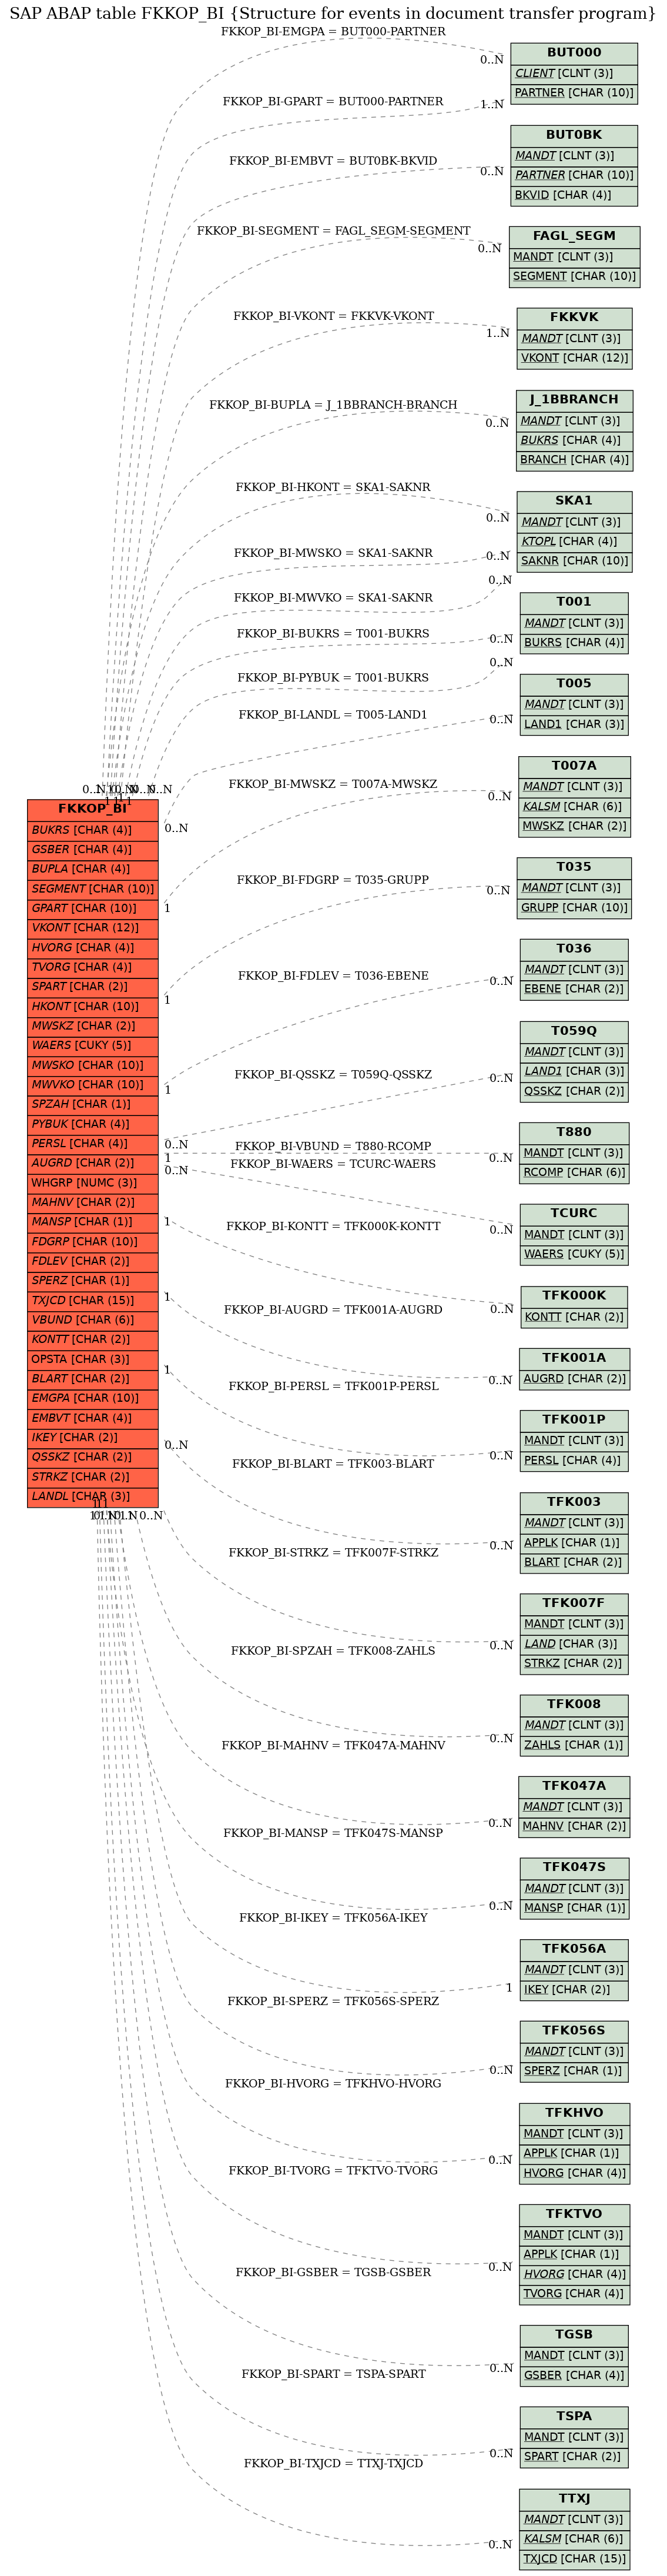 E-R Diagram for table FKKOP_BI (Structure for events in document transfer program)